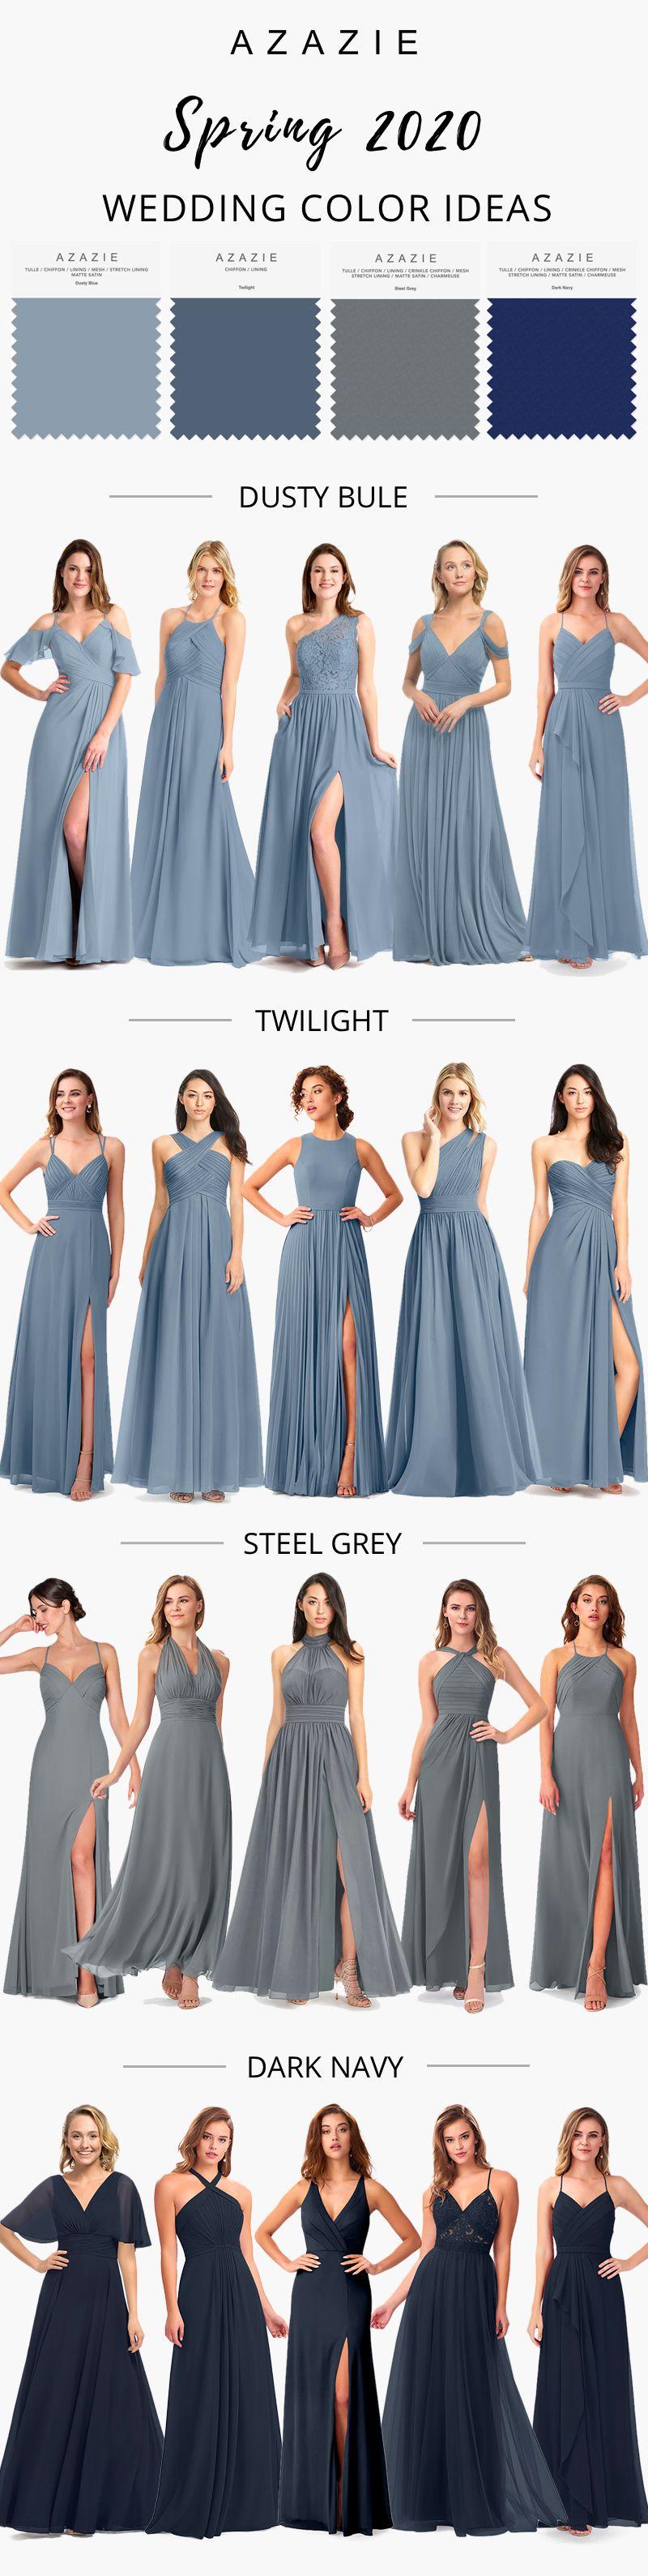 Blue Bridesmaid Dresses Blue Bridesmaid Dresses Blue Bridesmaids Bridesmaid Colors [ 3178 x 800 Pixel ]